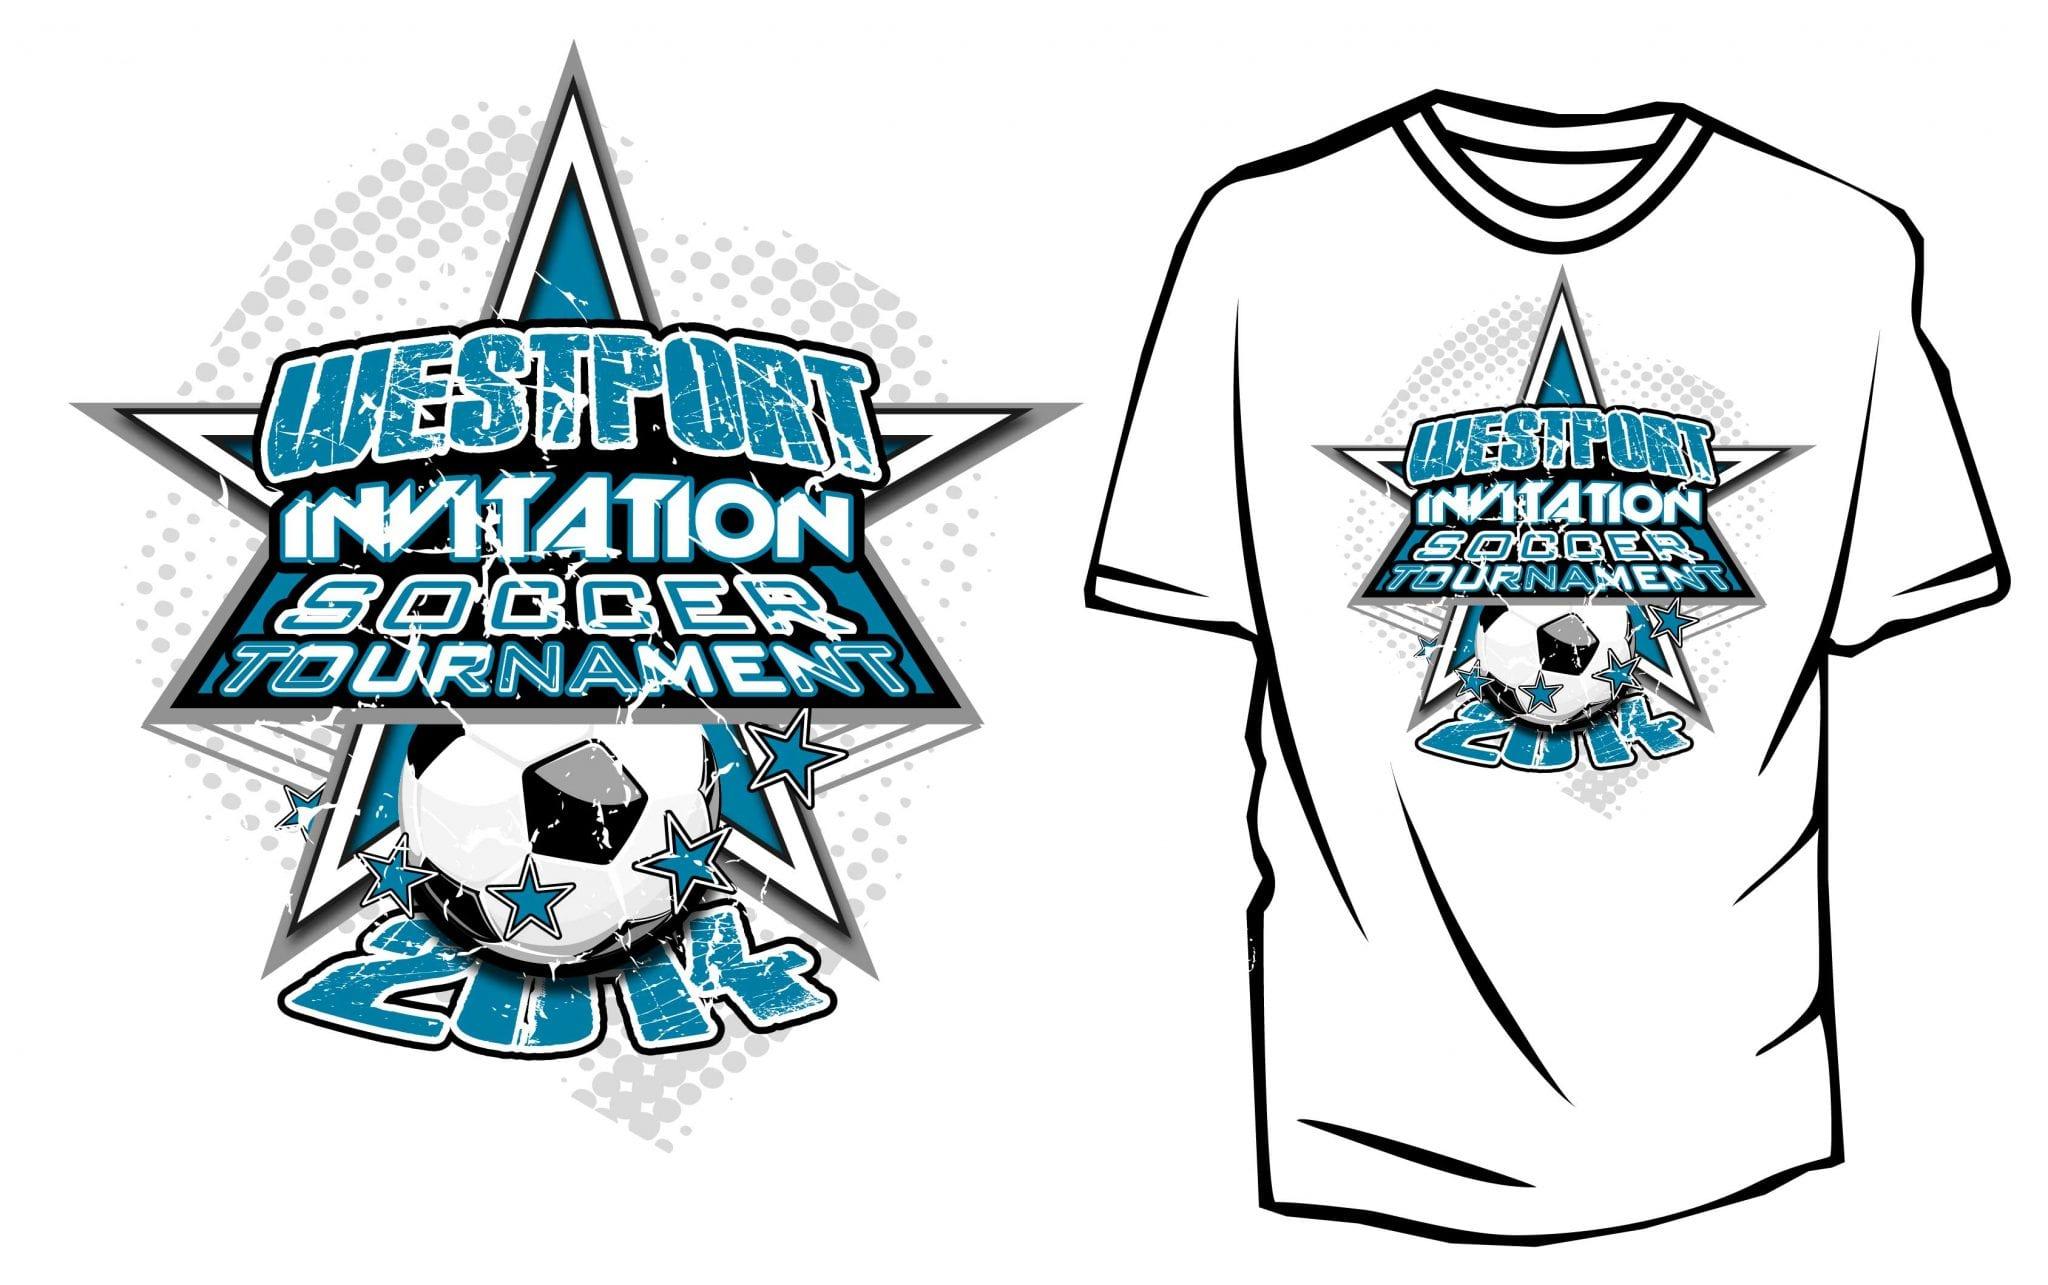 Design t shirt soccer - 2014 Westport Invitation Soccer Tournament Or Win2014 01